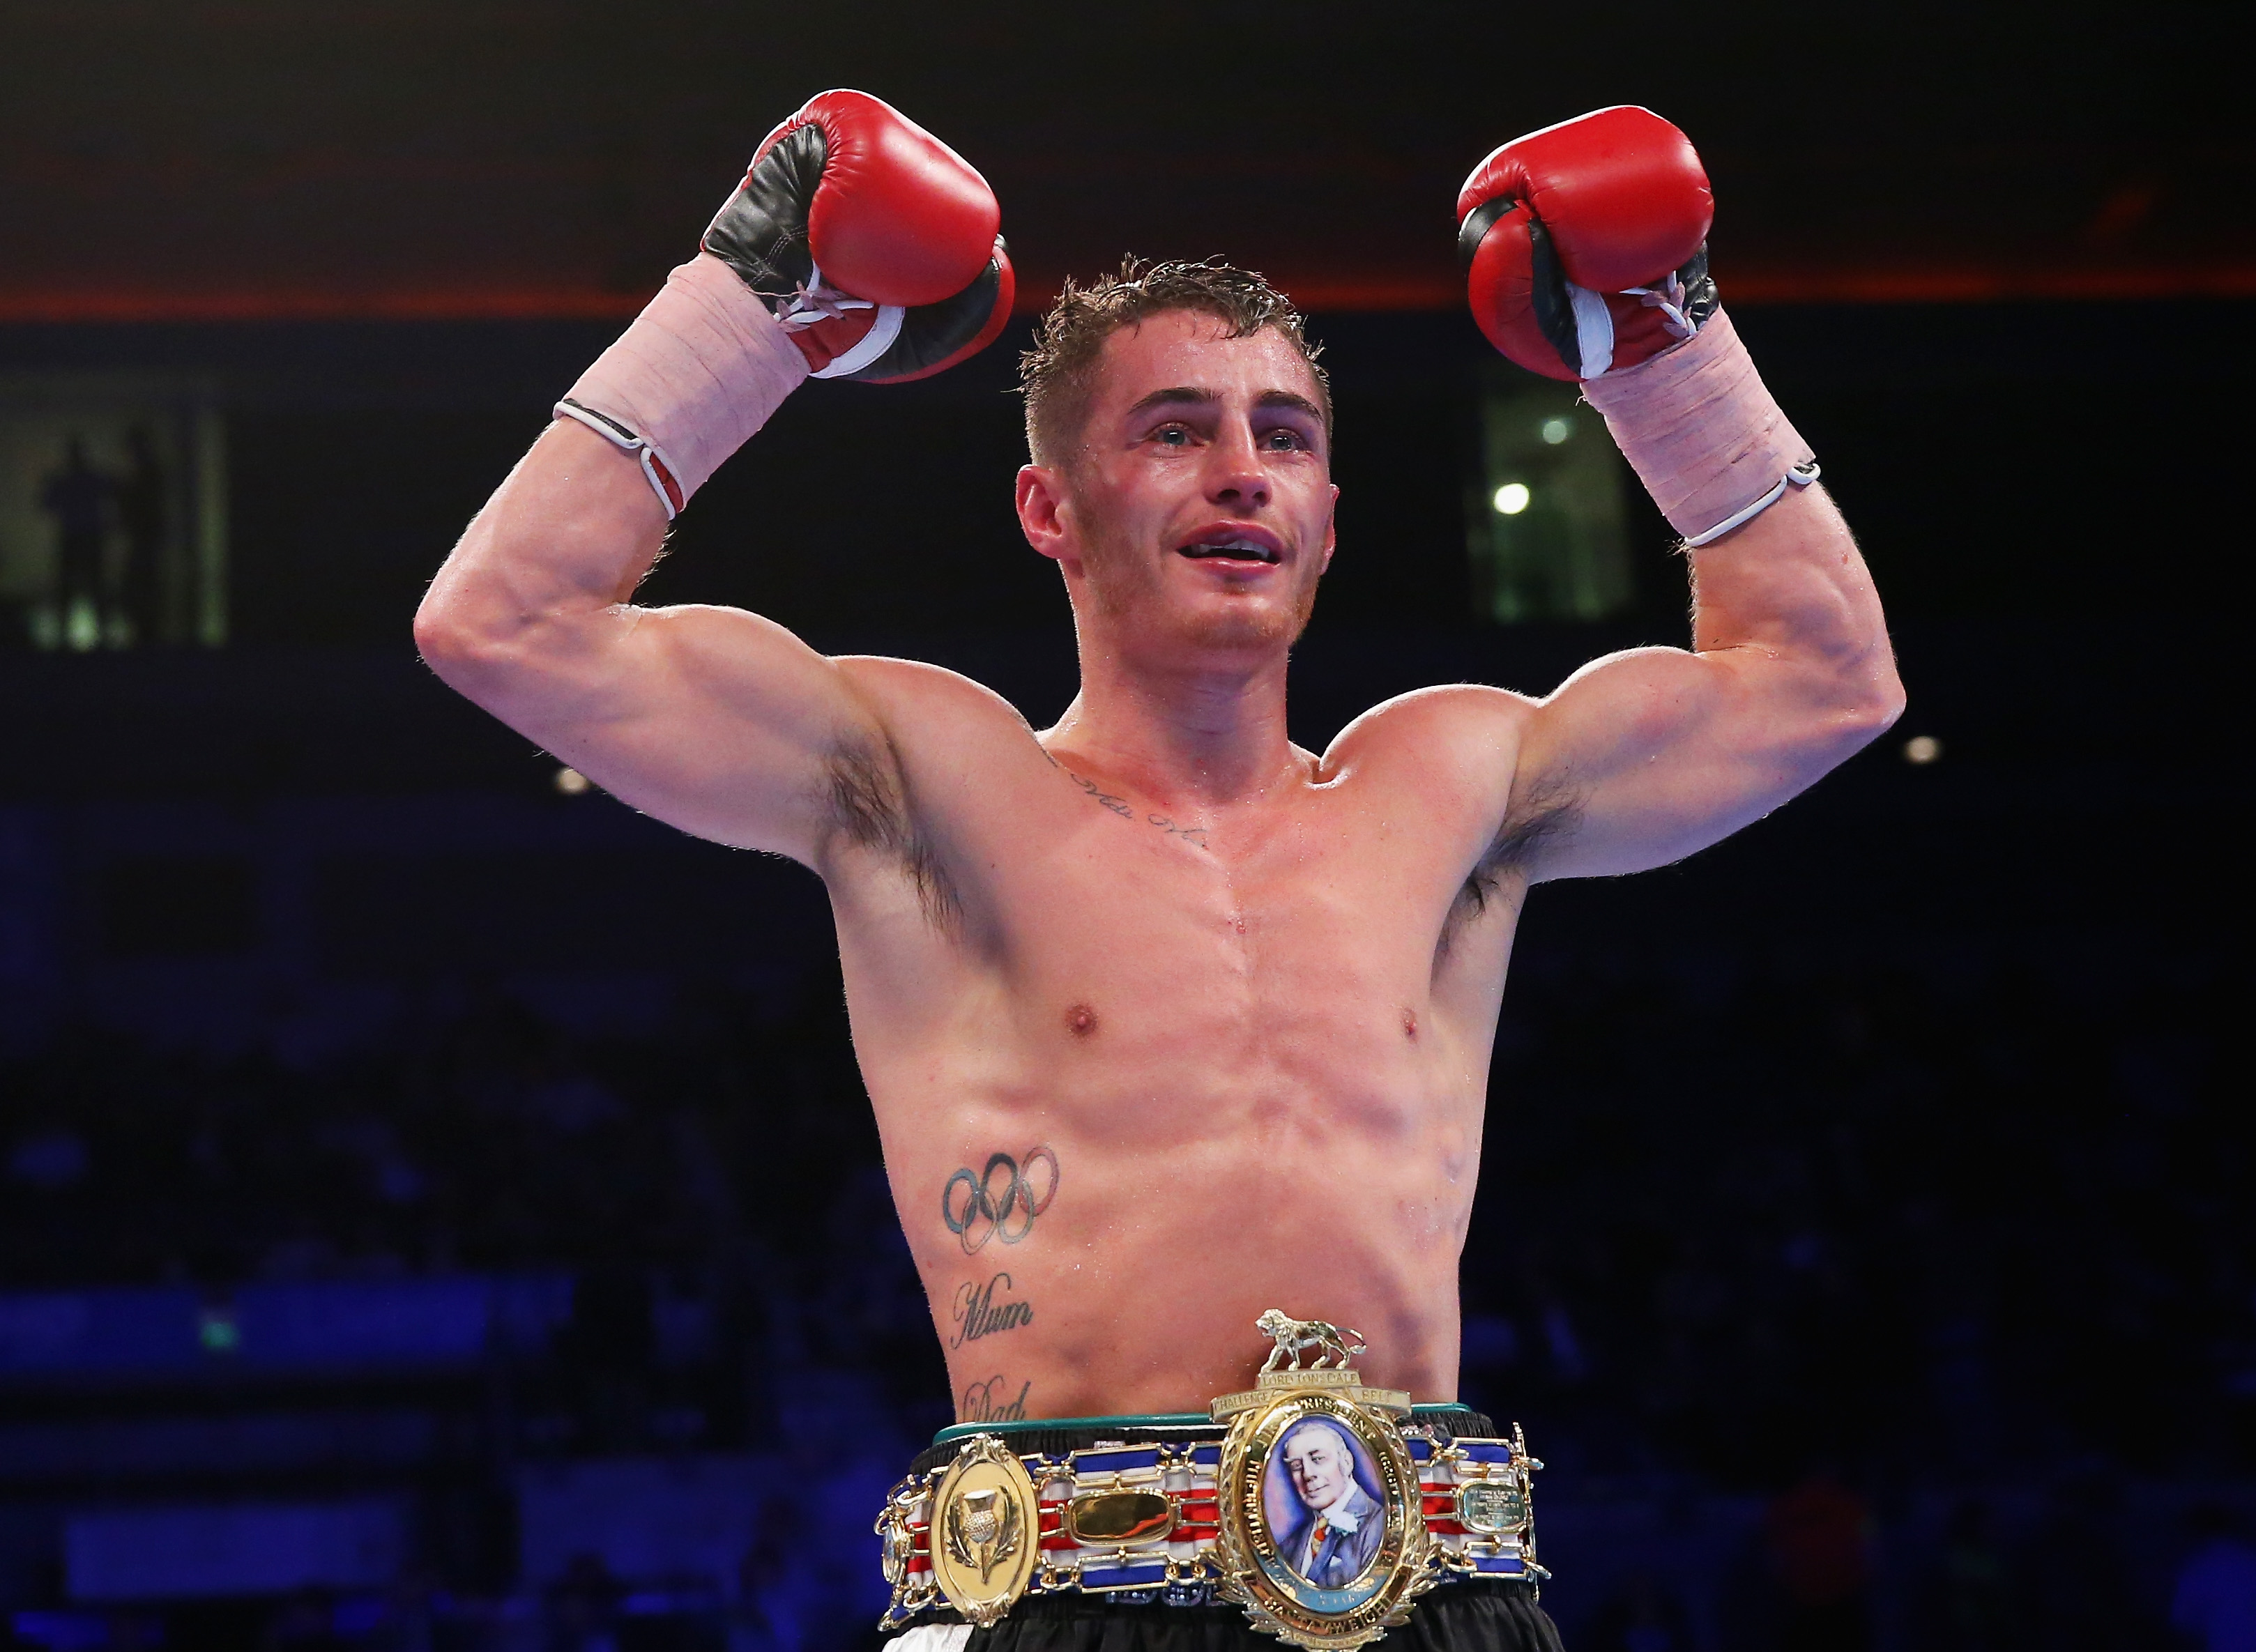 Bo boxer wladimir klitschko wikipedia the - Burnett Downs Haskins To Win Ibf Title